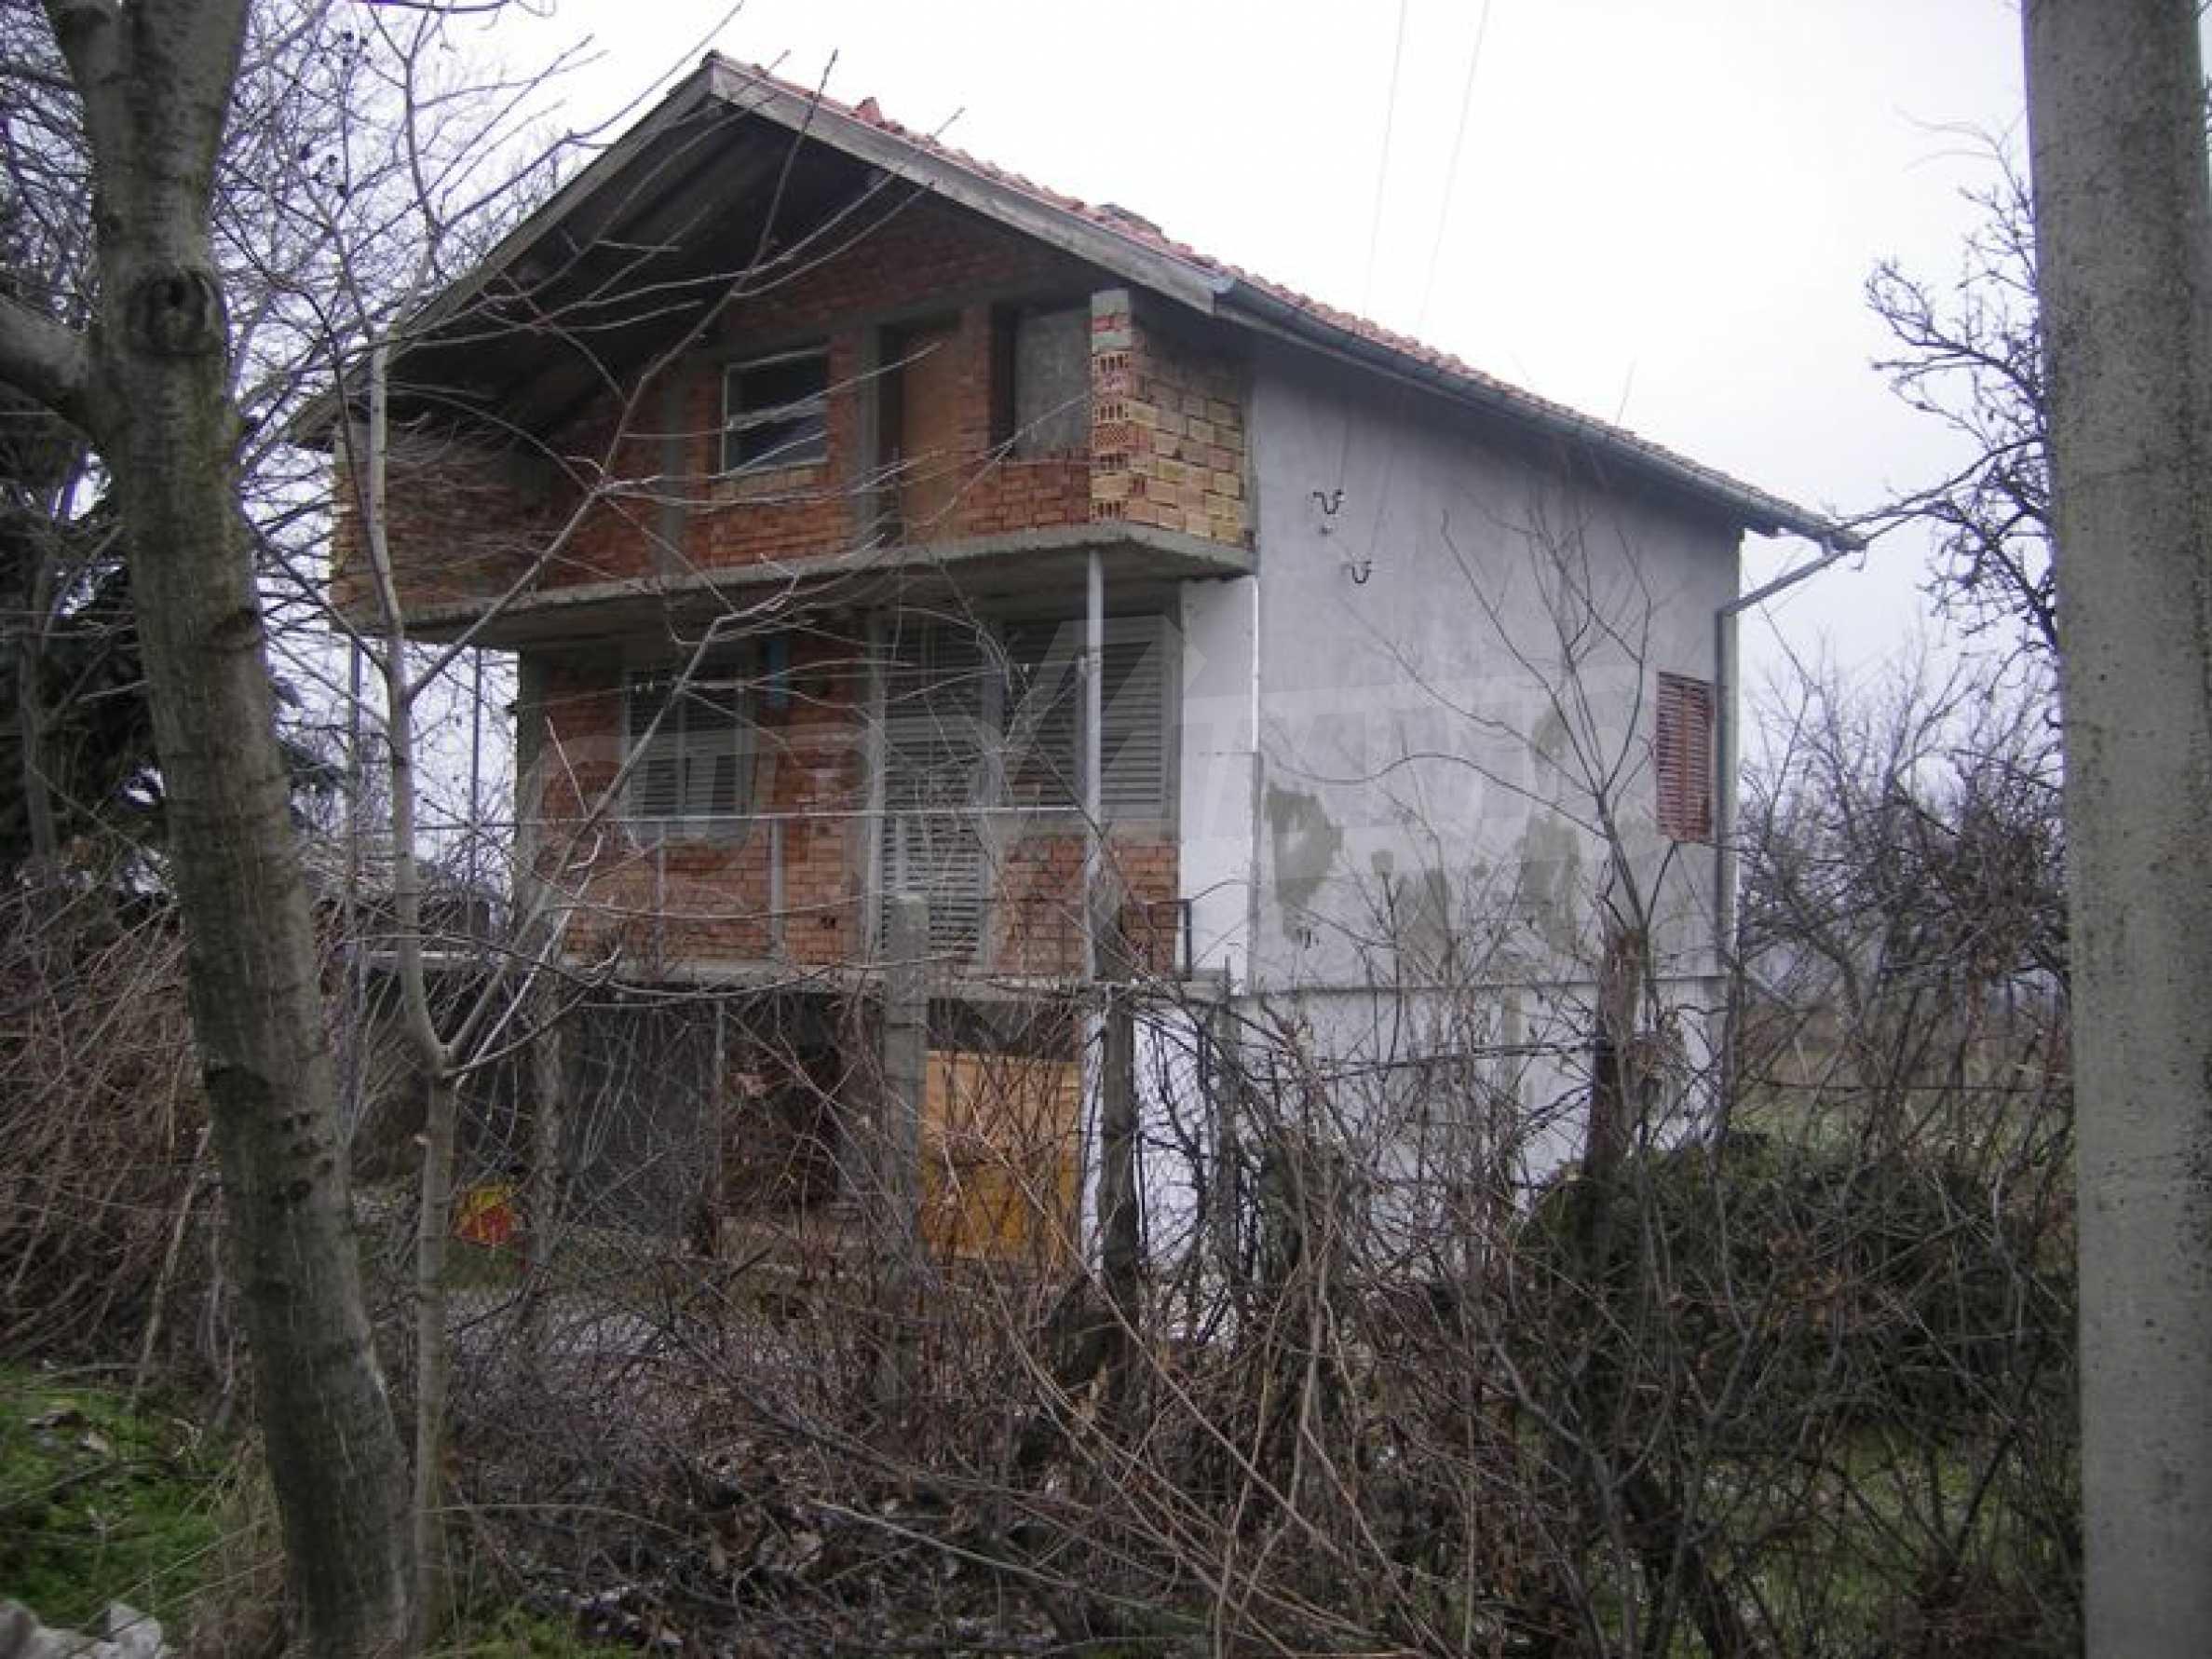 House for sale in Shtarklevo village